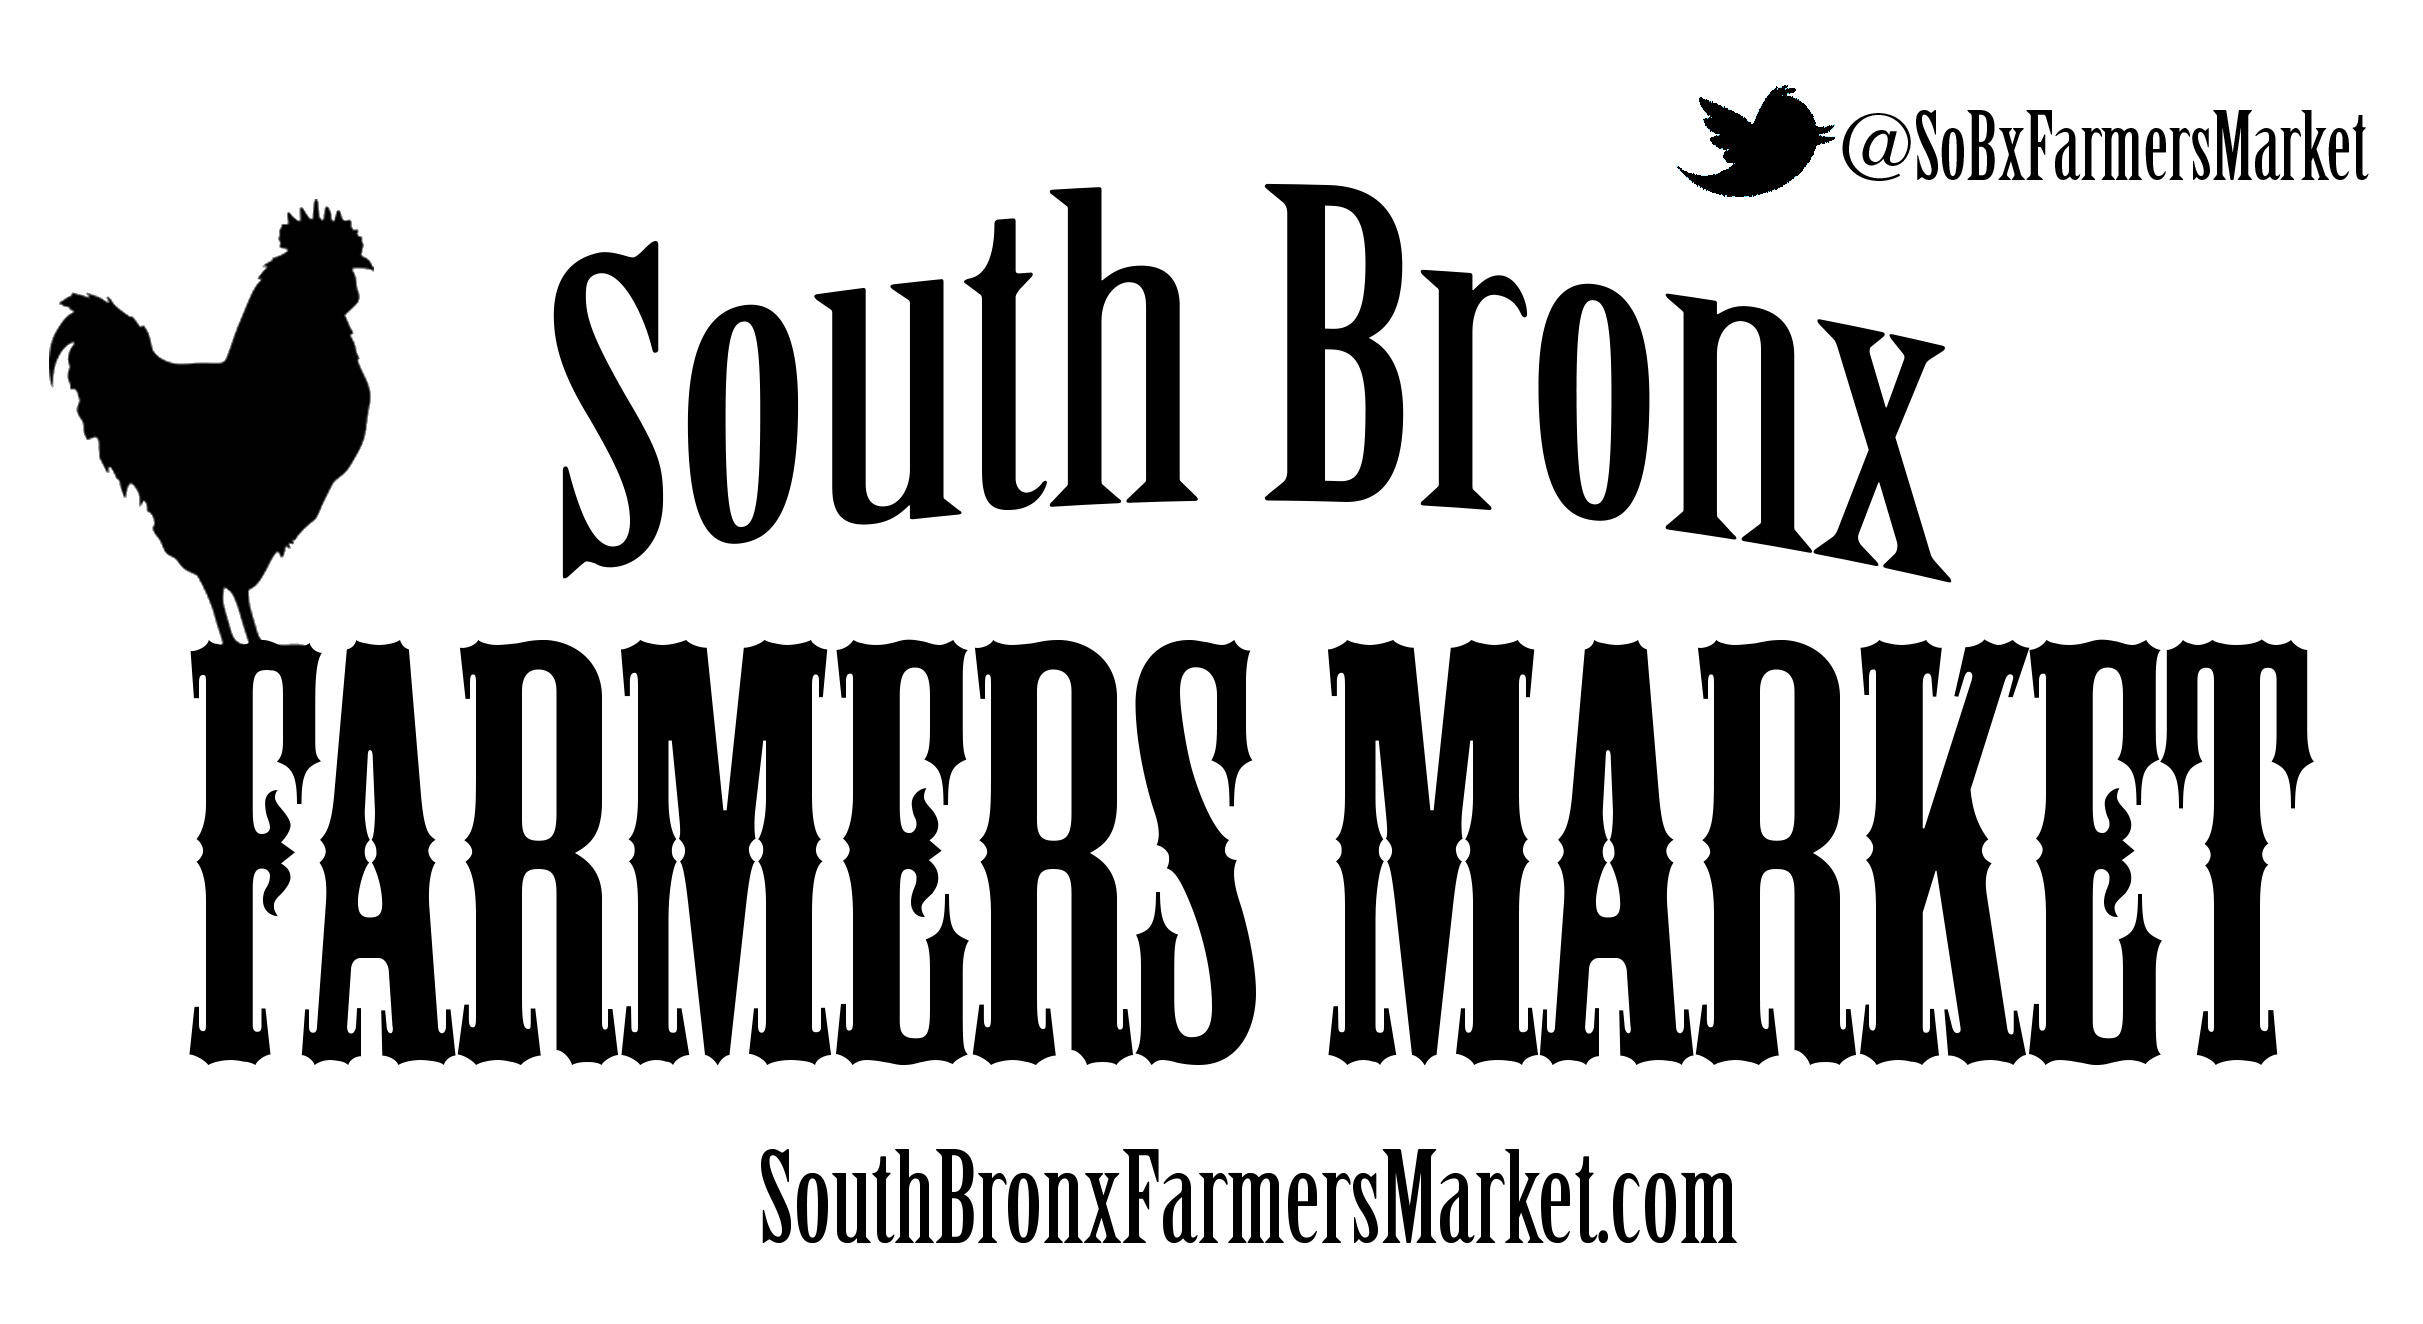 South Bronx Farmers Market